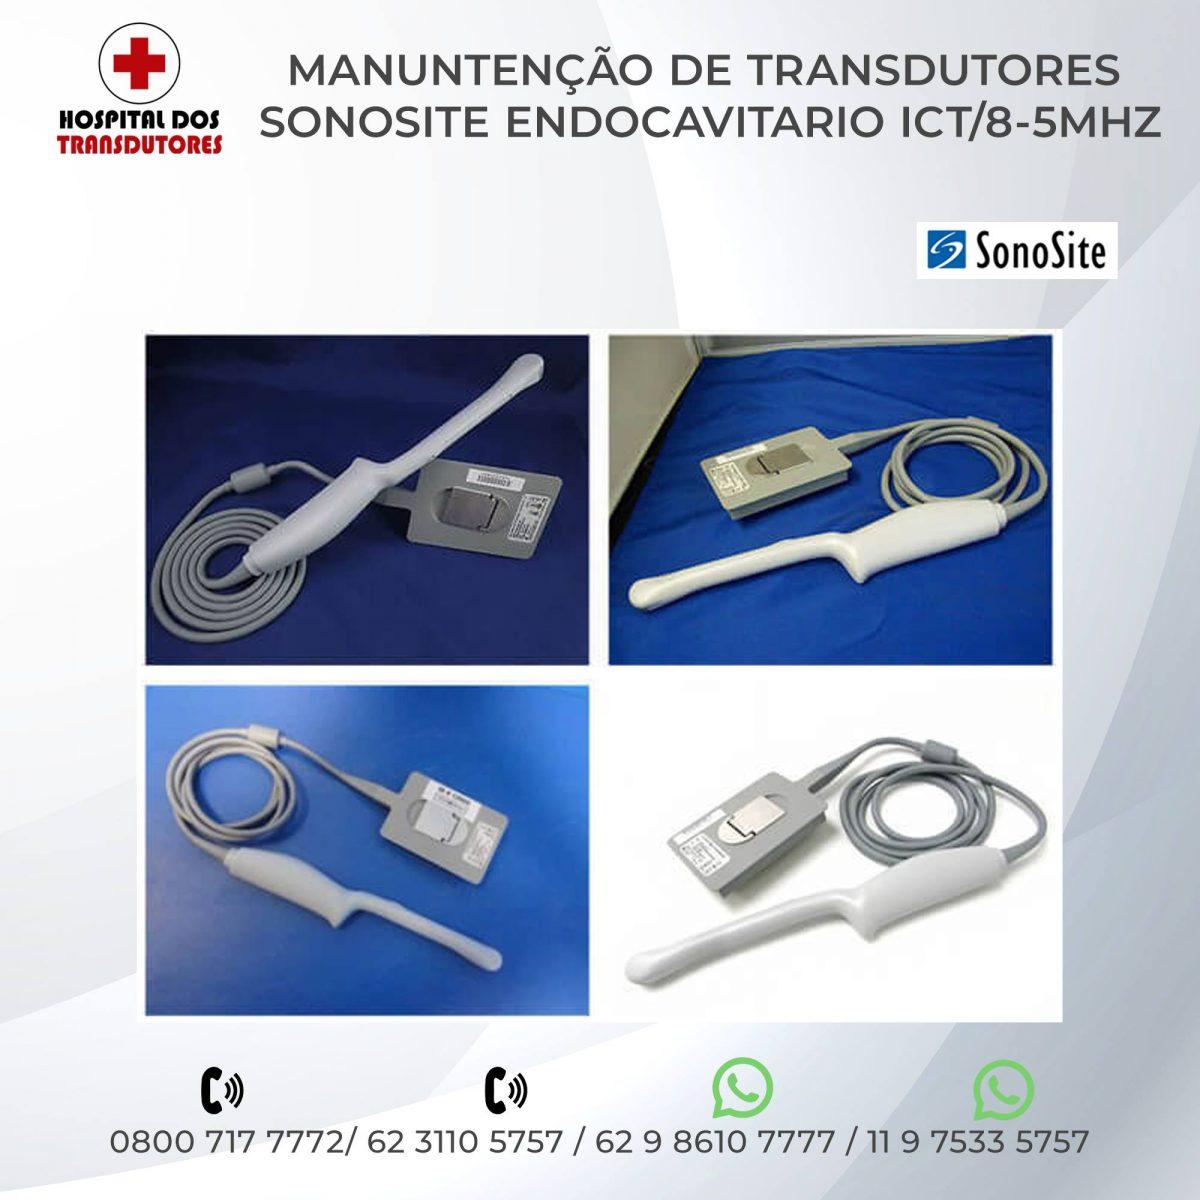 6-TRANSDUTOR-SONOSITE-ENDOCAVITARIO